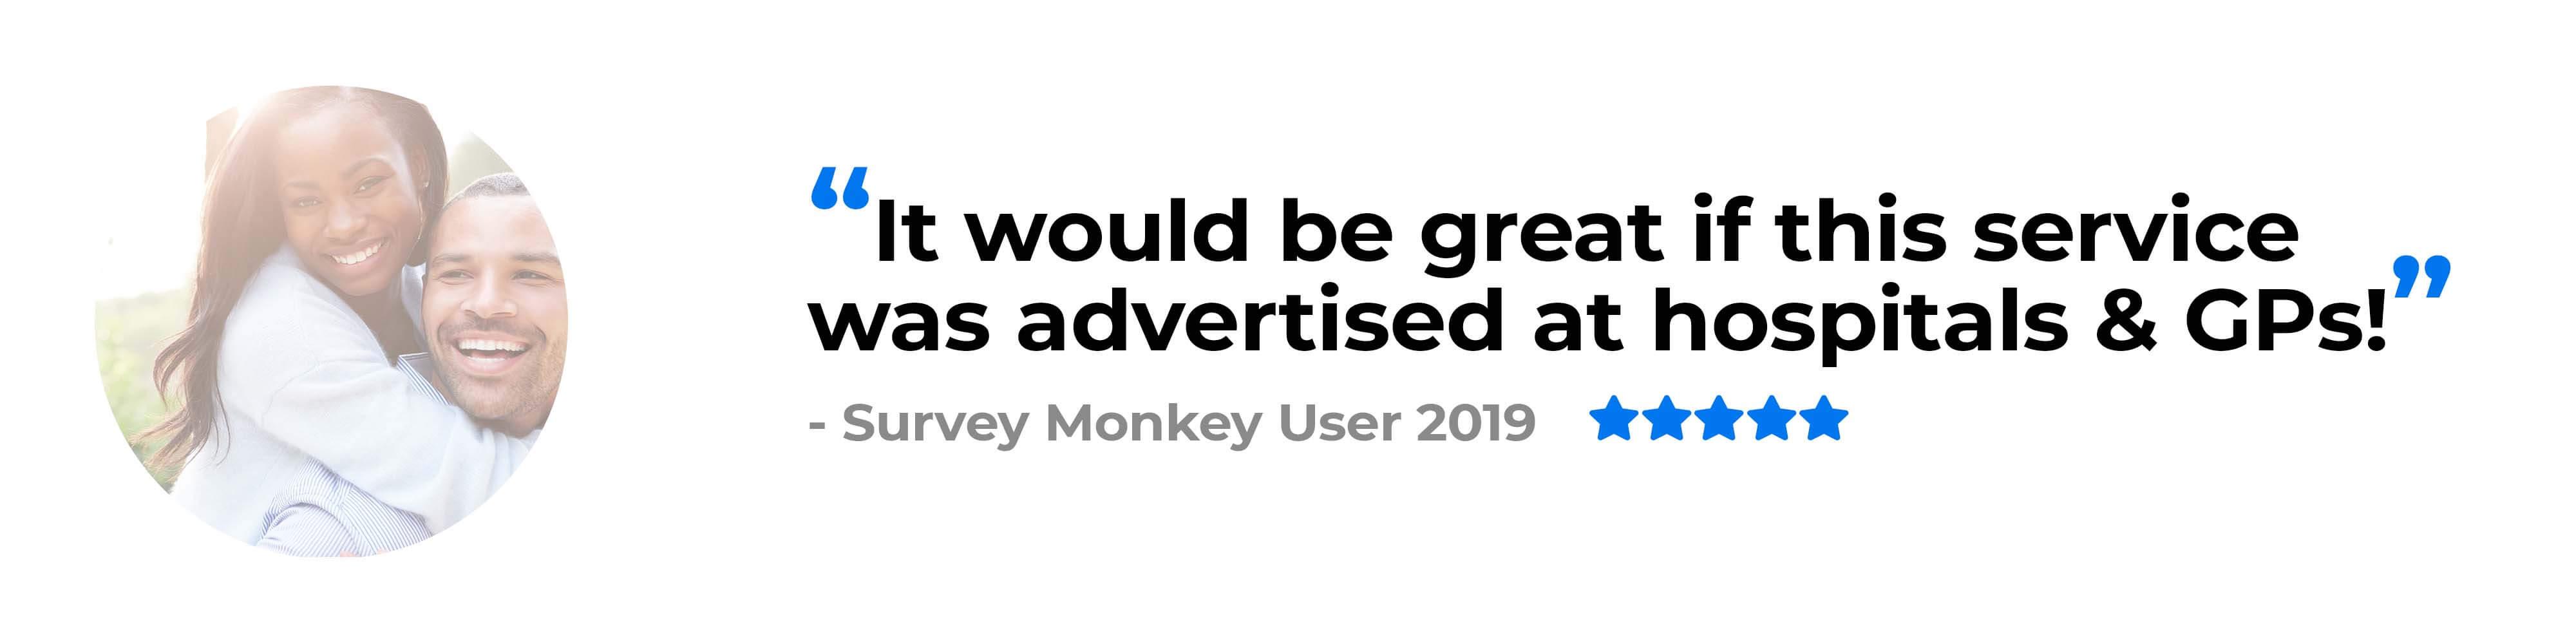 survey quote - 2019 Survey Results